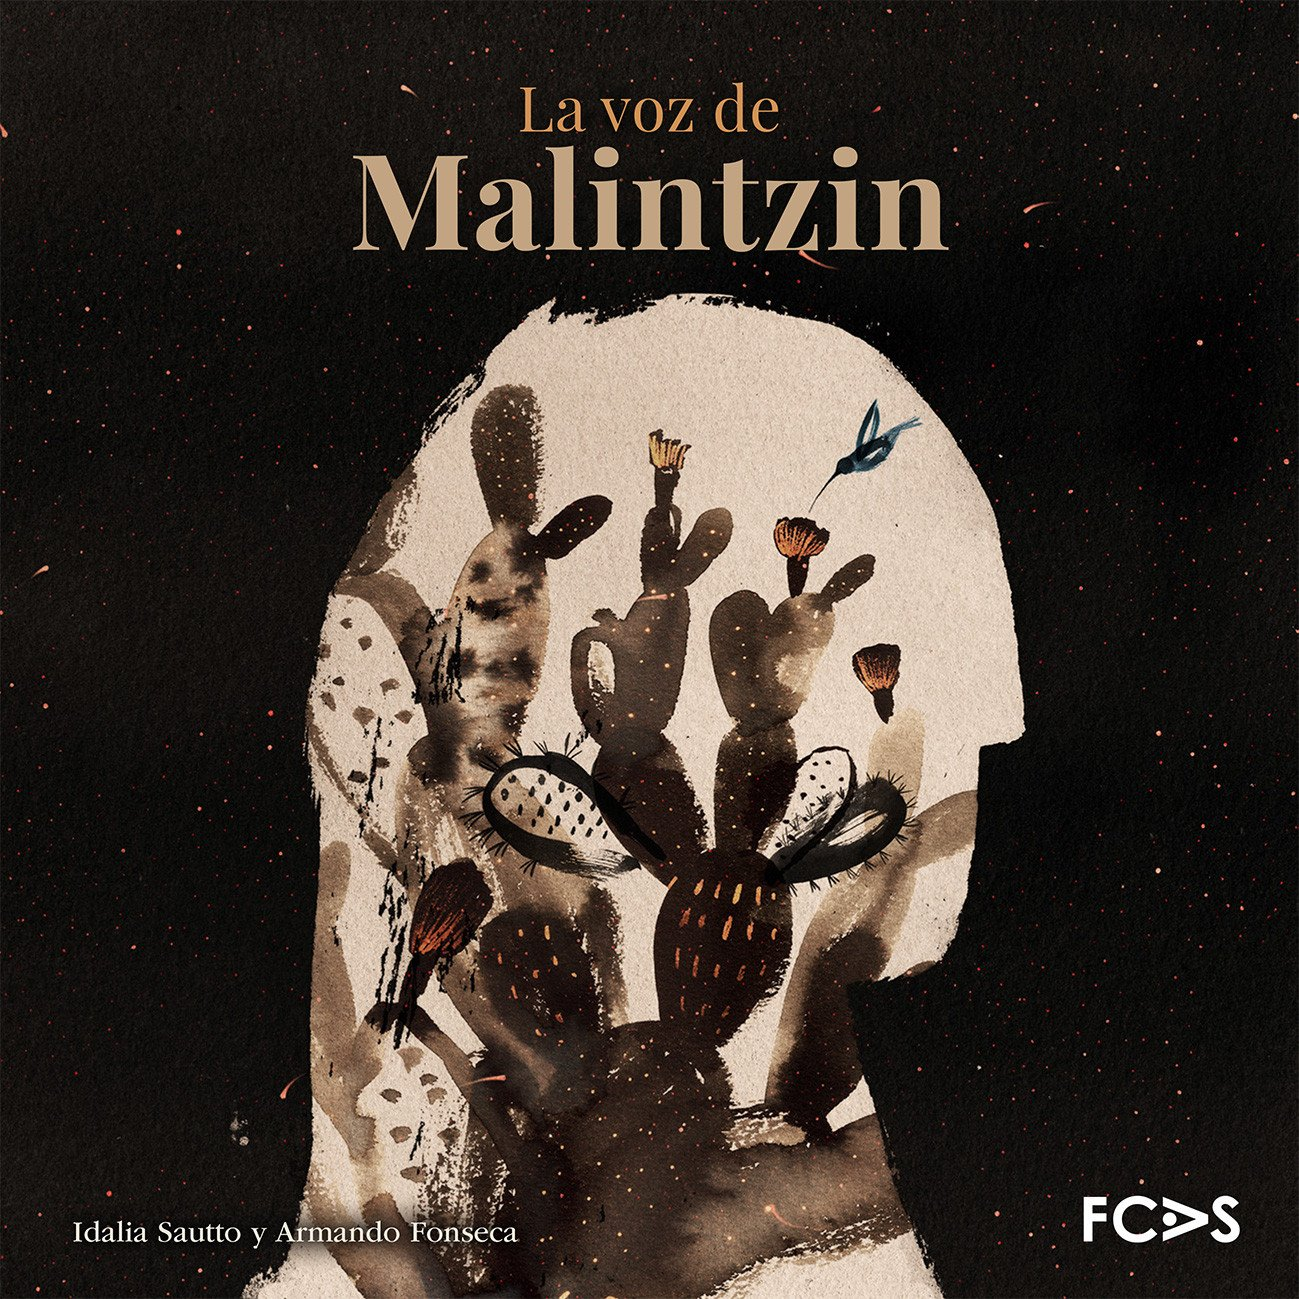 La voz de Malintzin